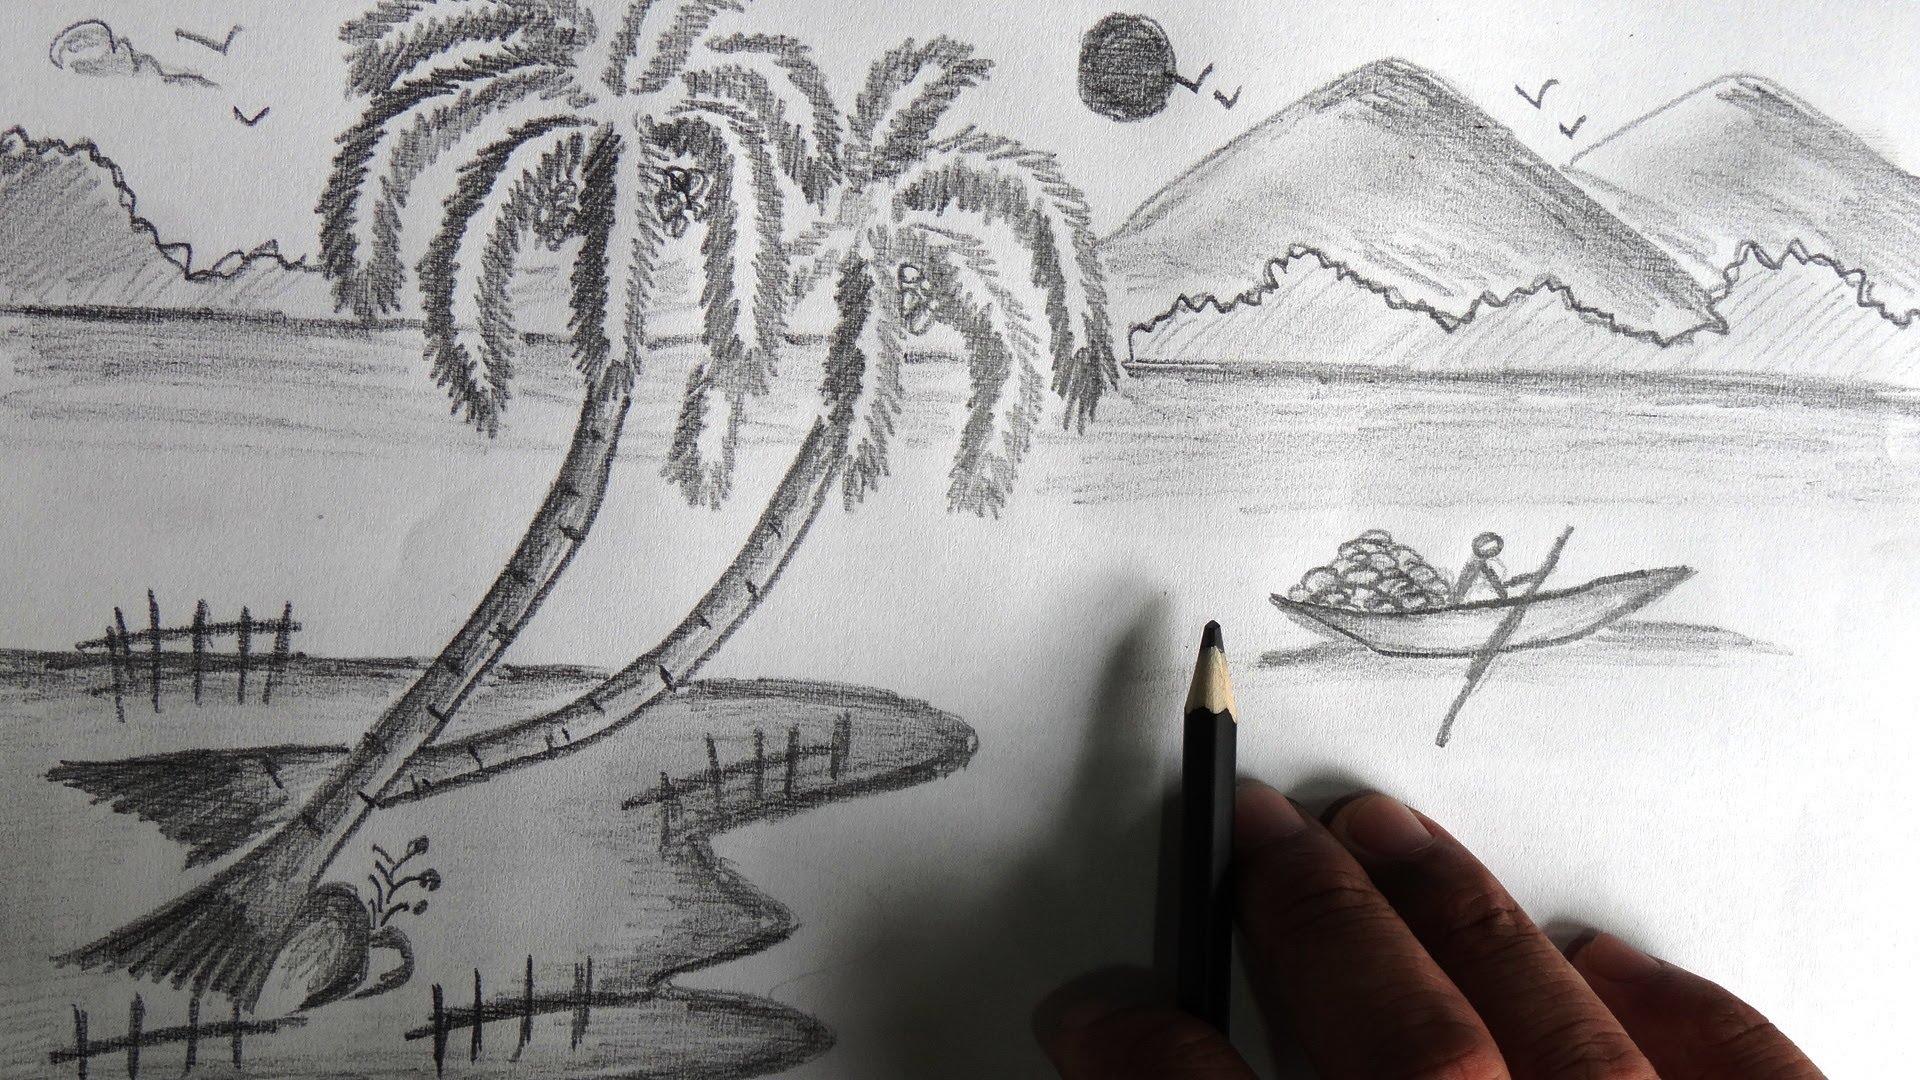 Drawn scenery beginner Landscapes For scenery Landscape Easy